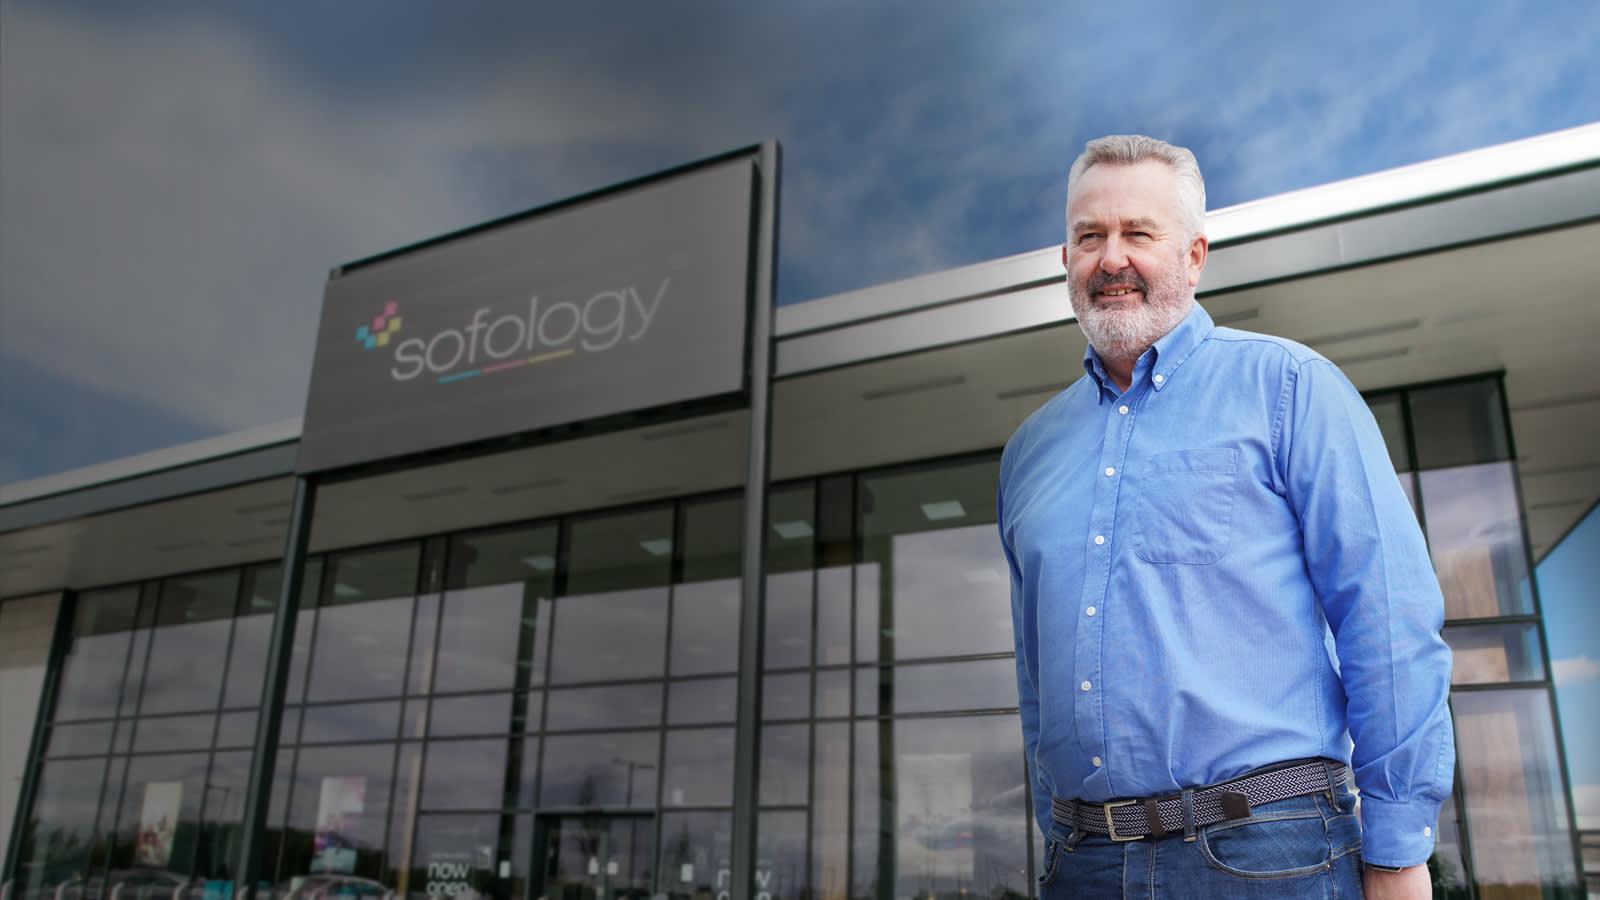 Sofology head of property